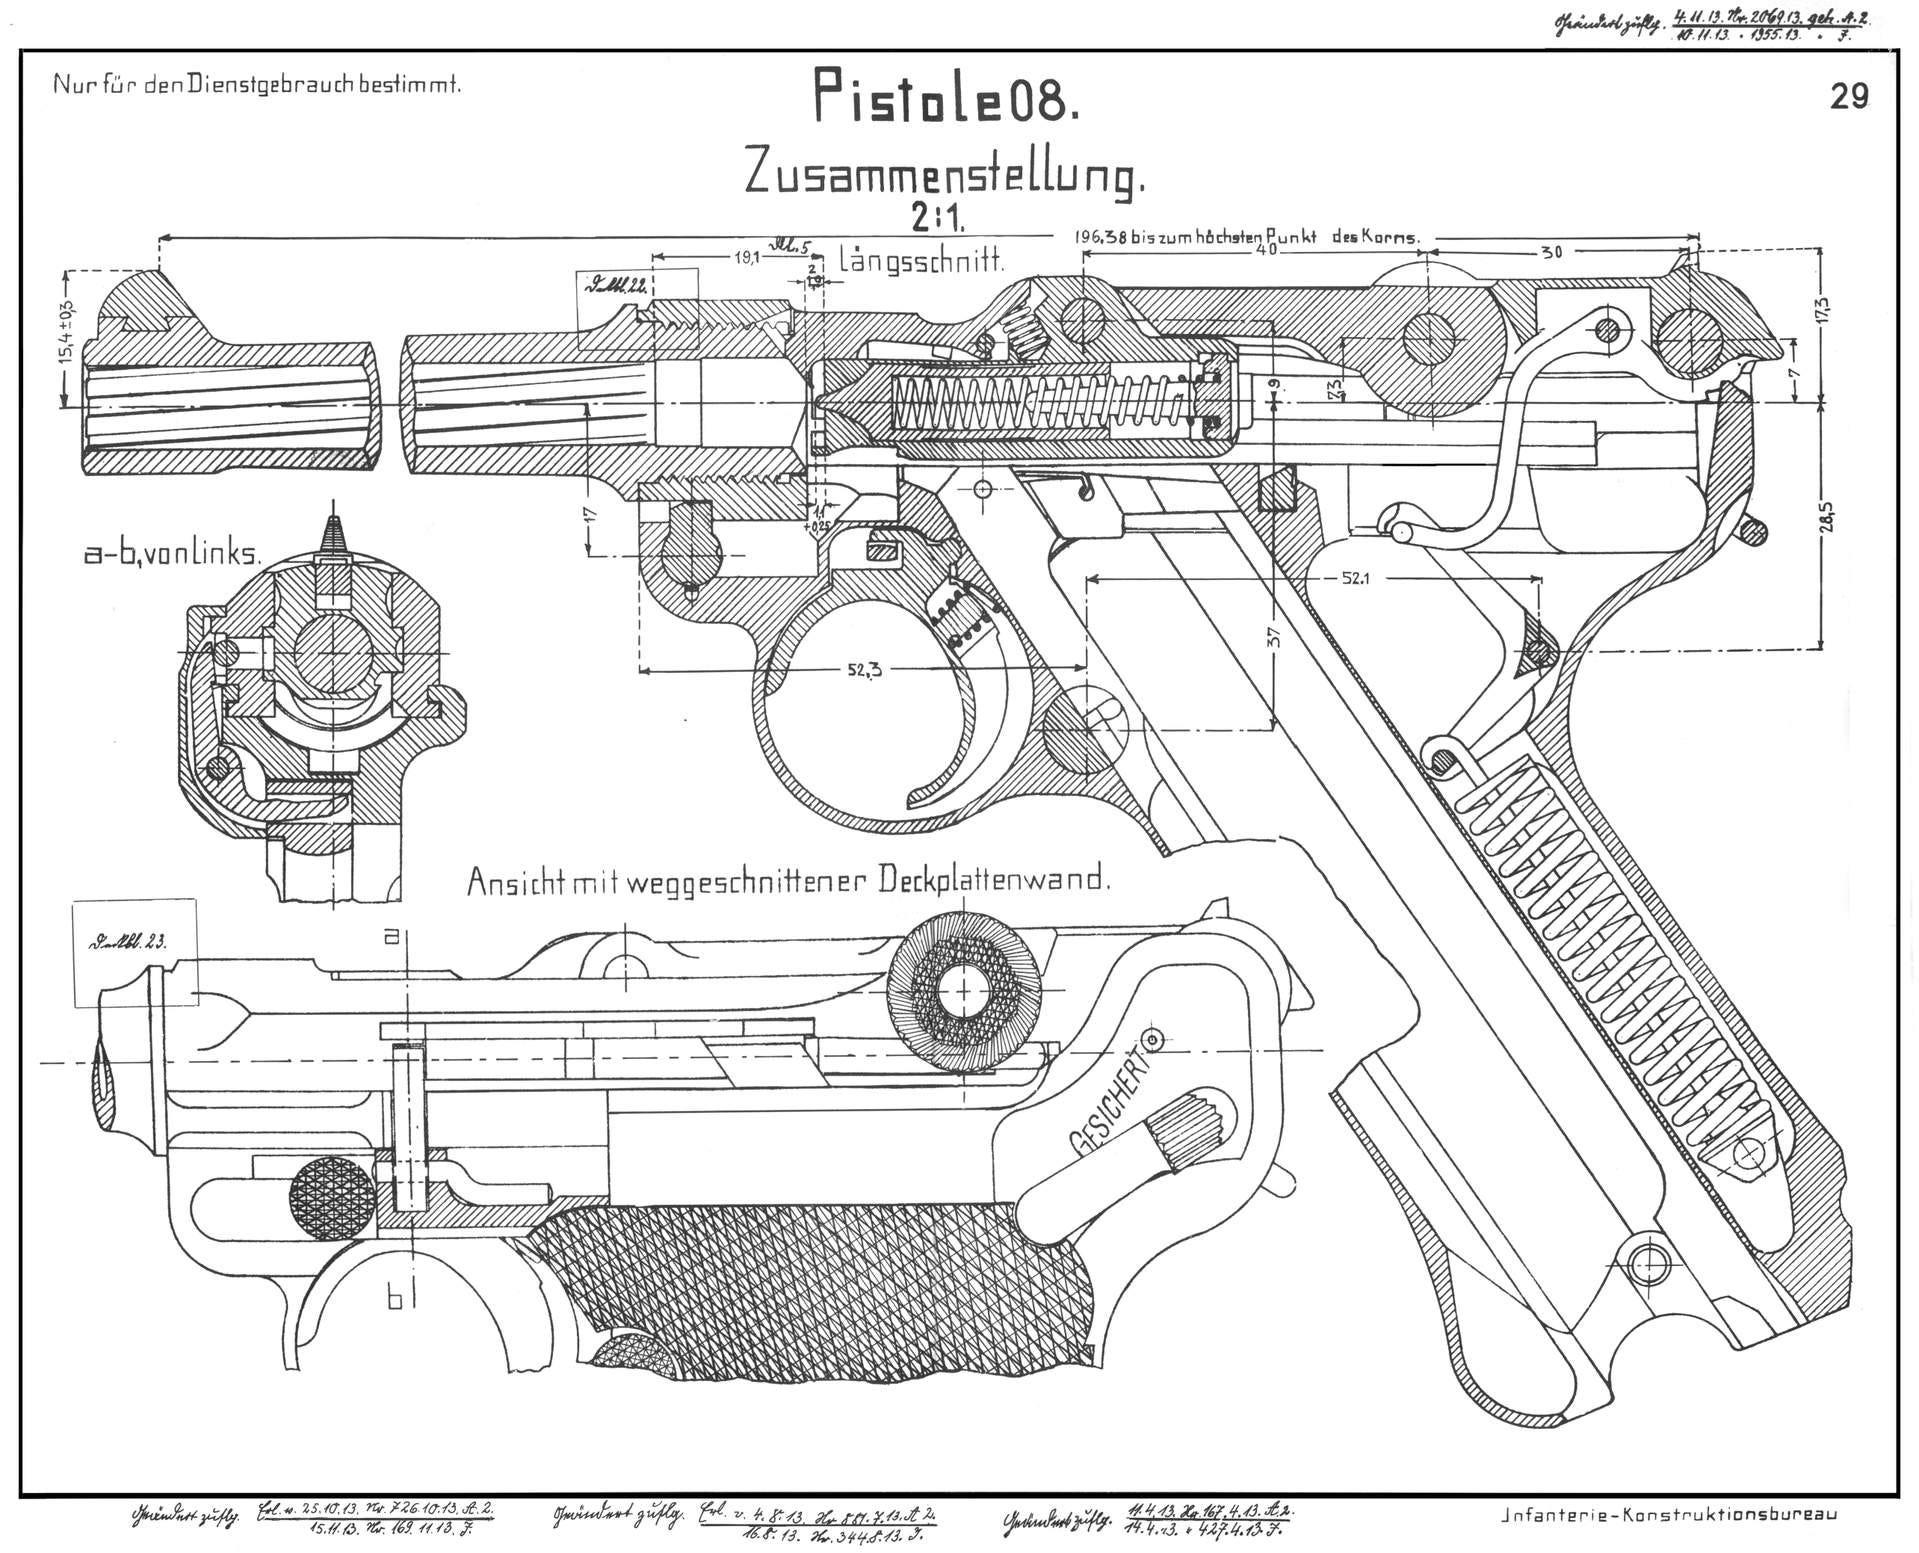 The Nazis' Handgun – War Is Boring